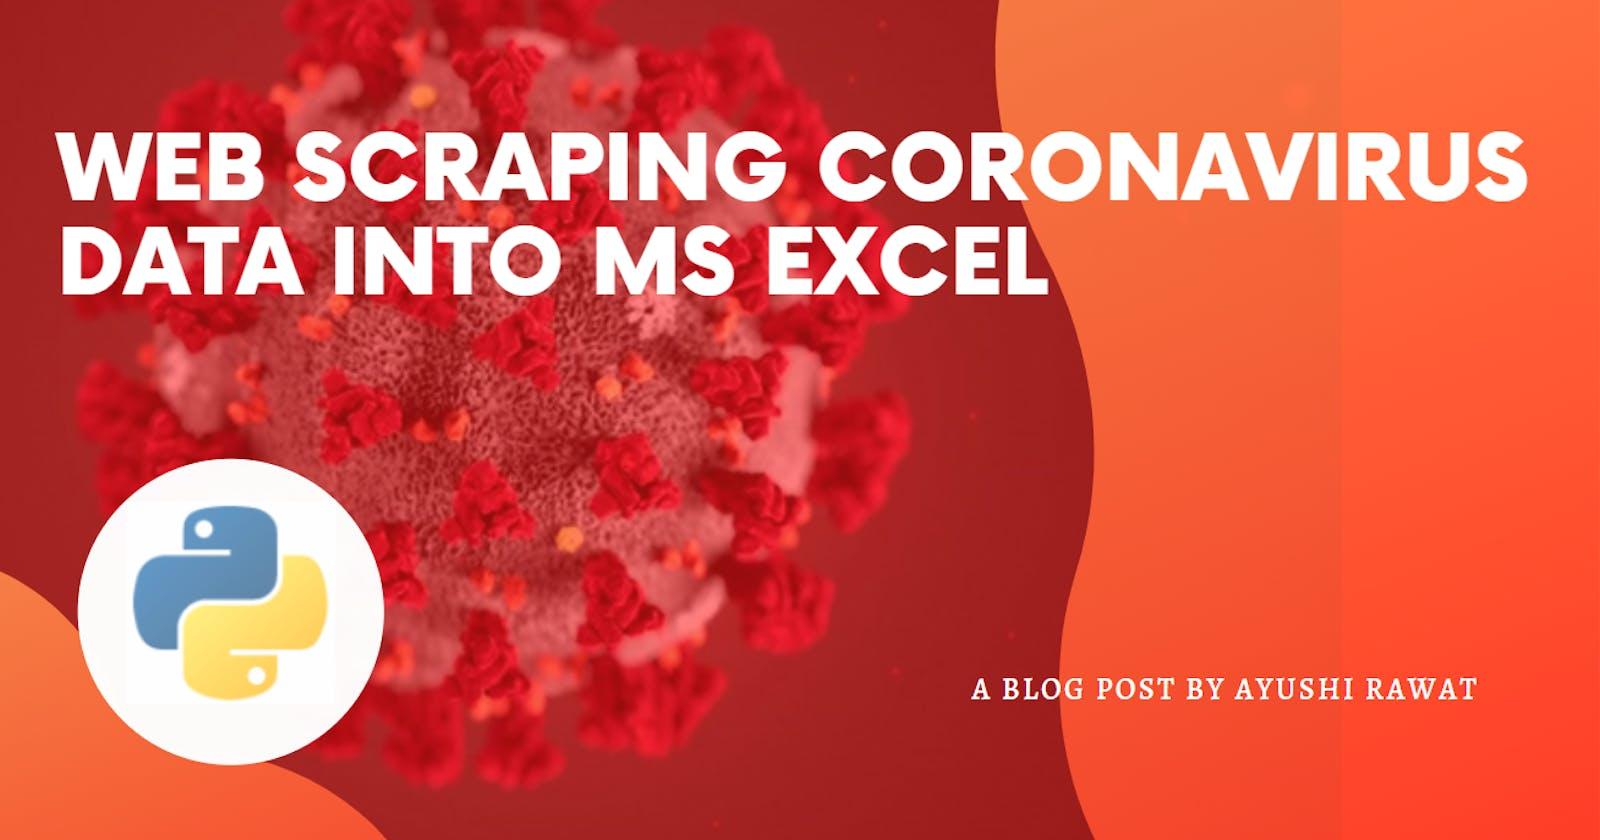 Web Scraping Coronavirus Data into MS Excel